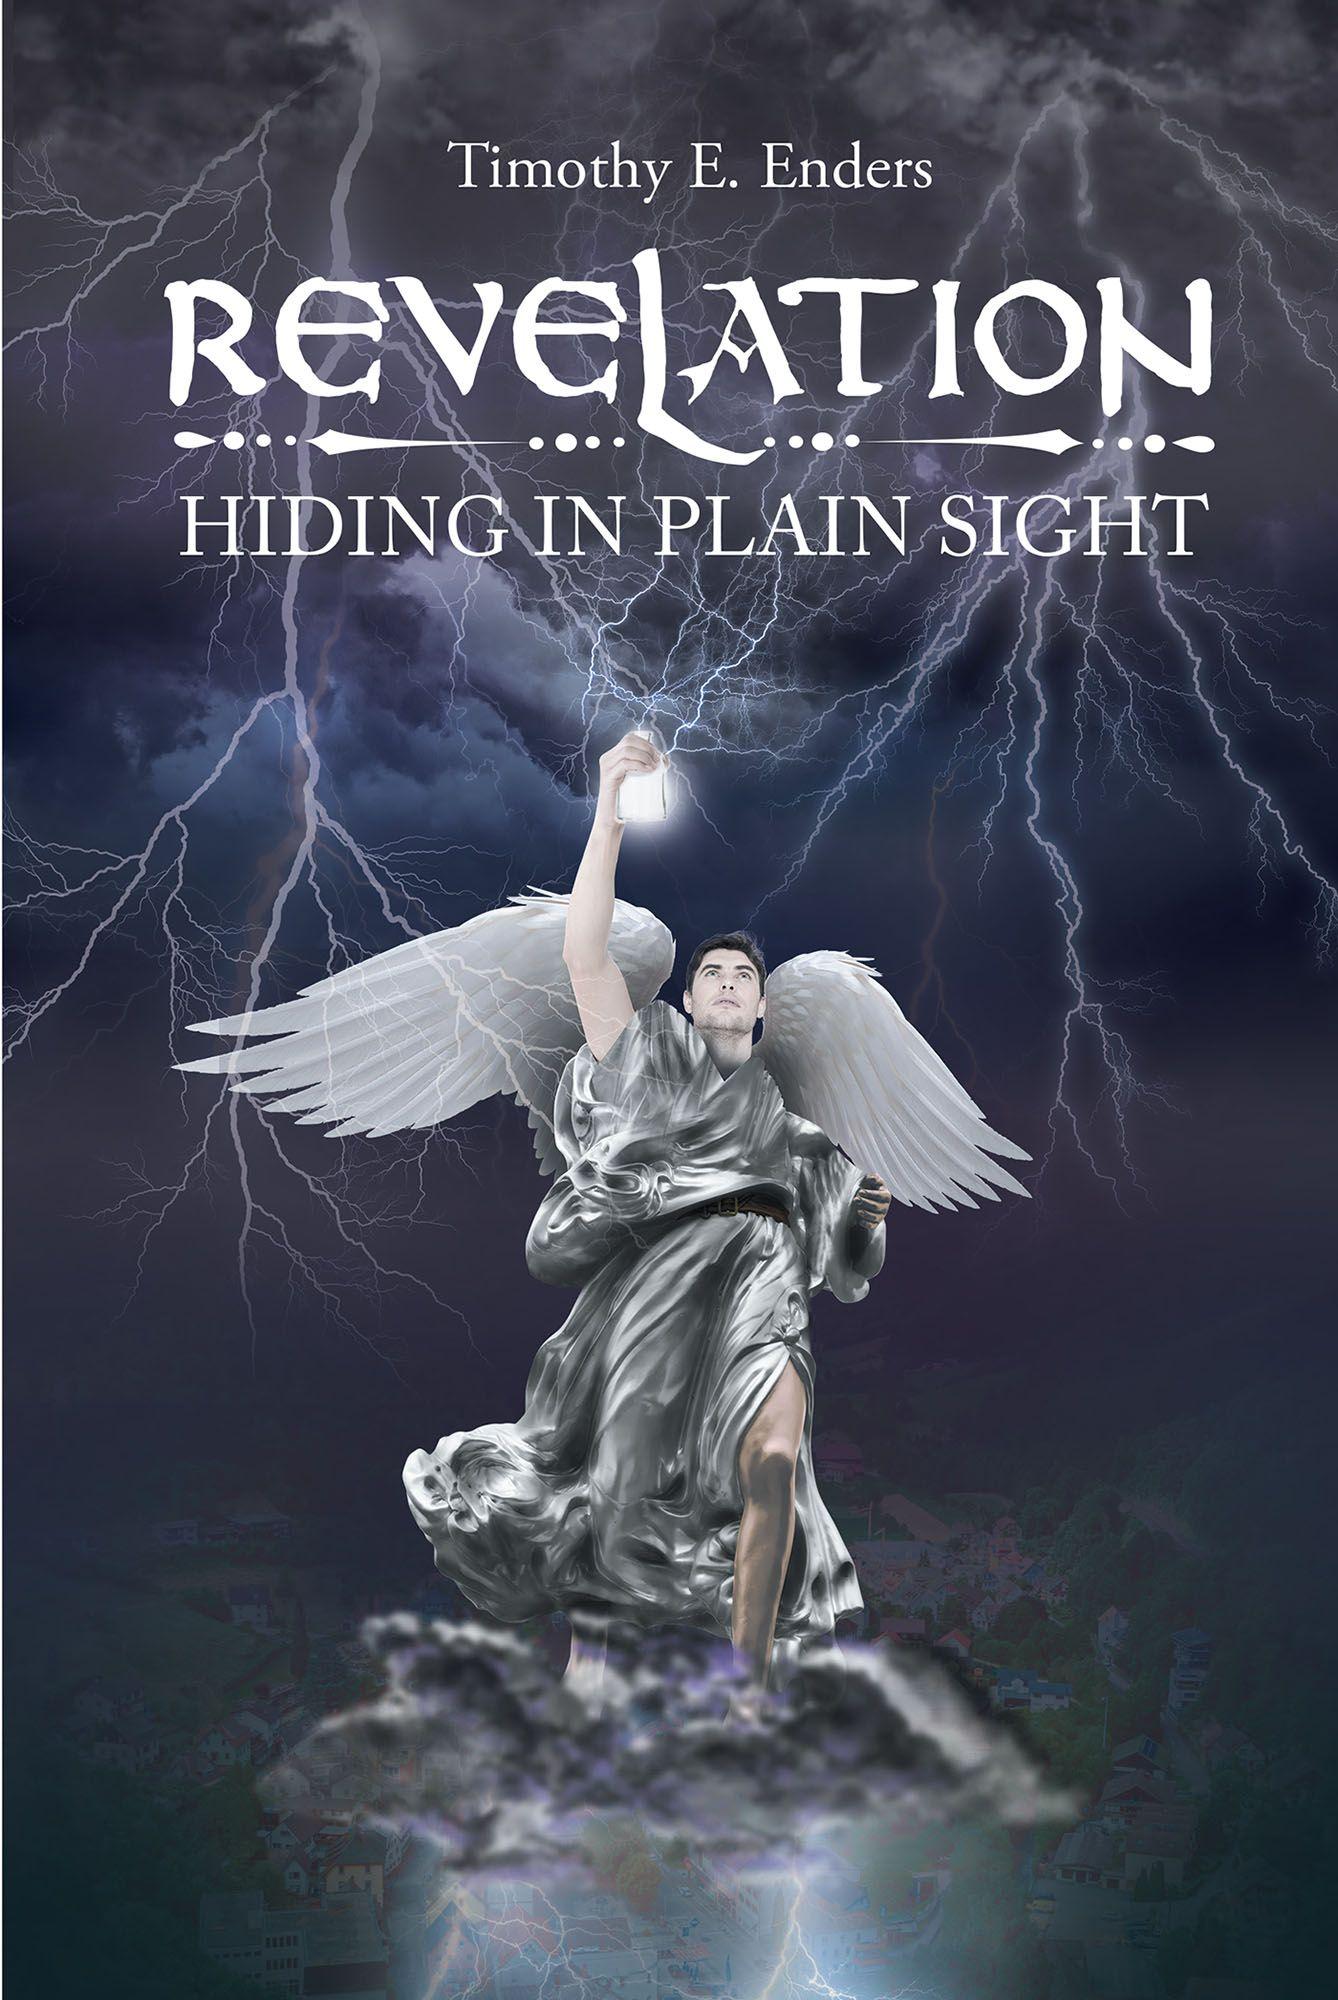 books Covenant Books Timothy E. Enders's new book